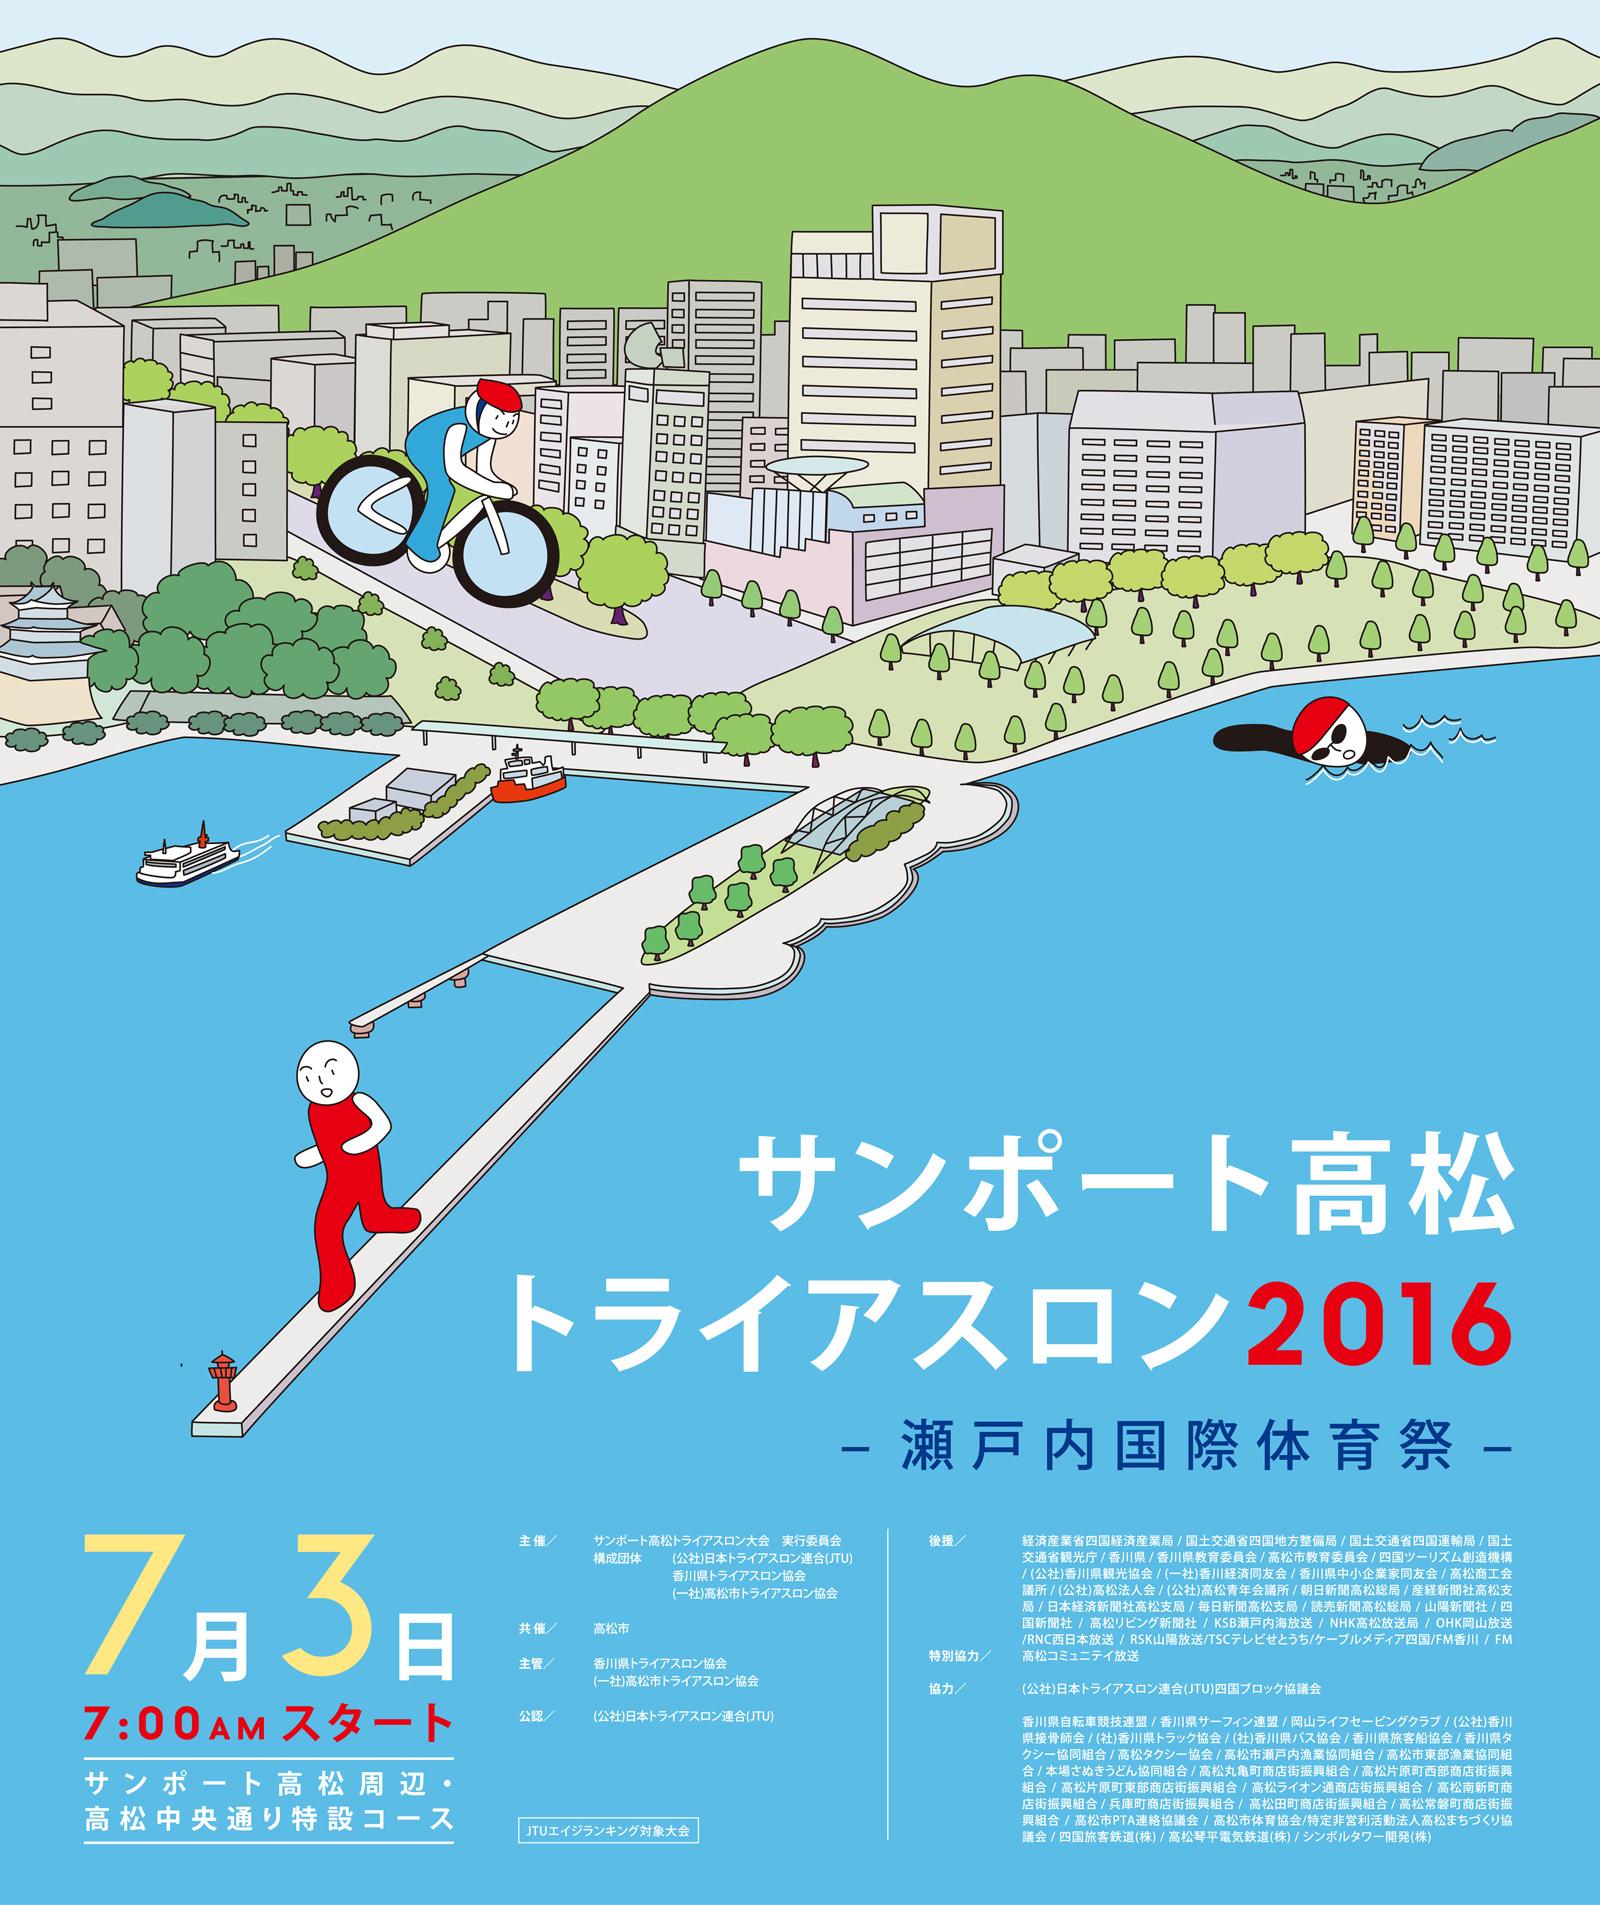 takamatsu_poster_2016_1600